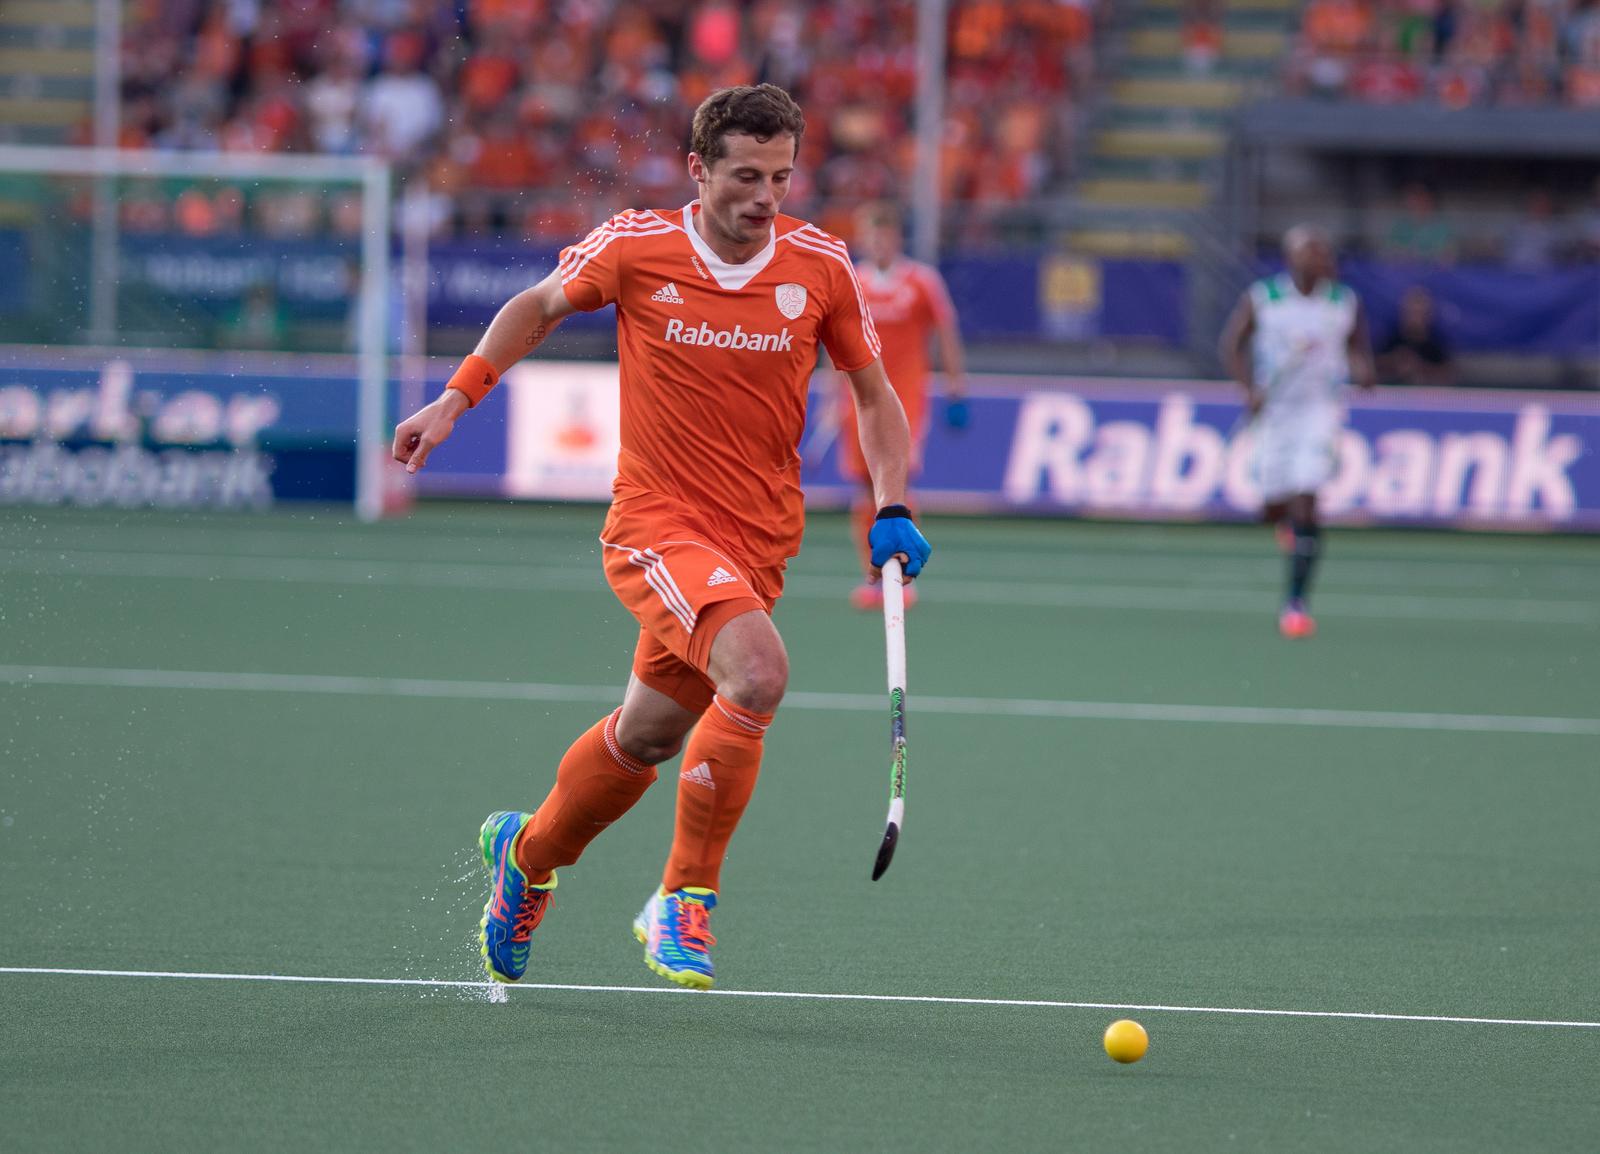 Baart Oranje nederland Zuid-Afrika heren WK RU